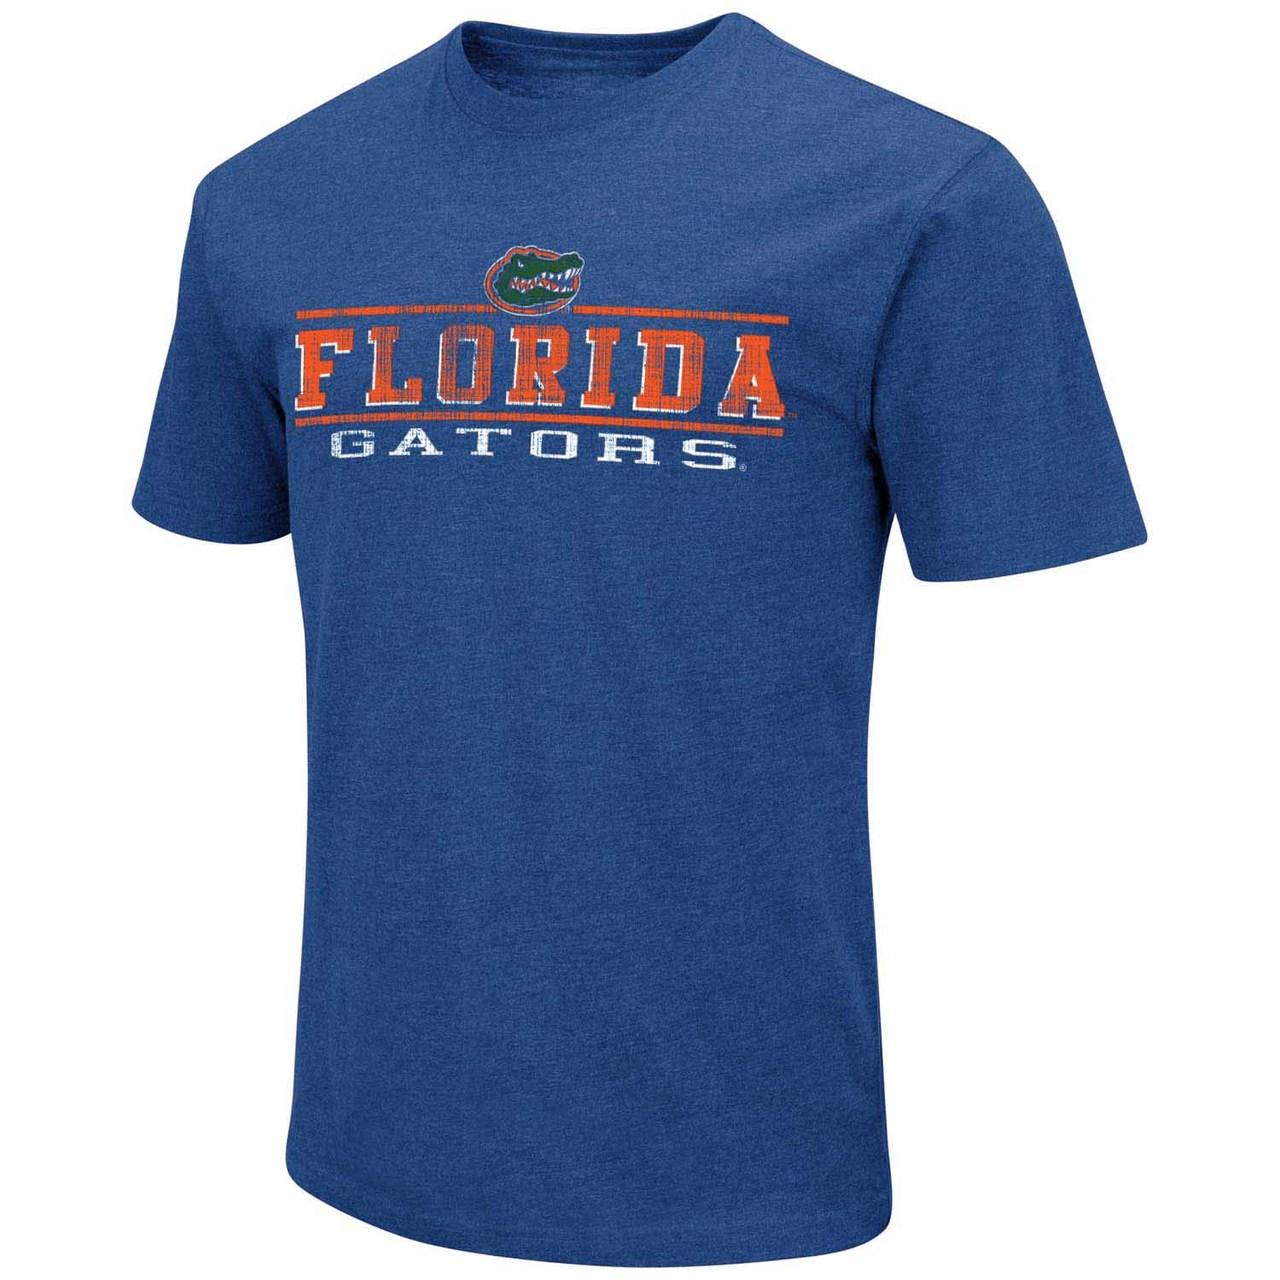 Florida Gators Youth NCAA Vintage Icon Logo T-Shirt  - Royal